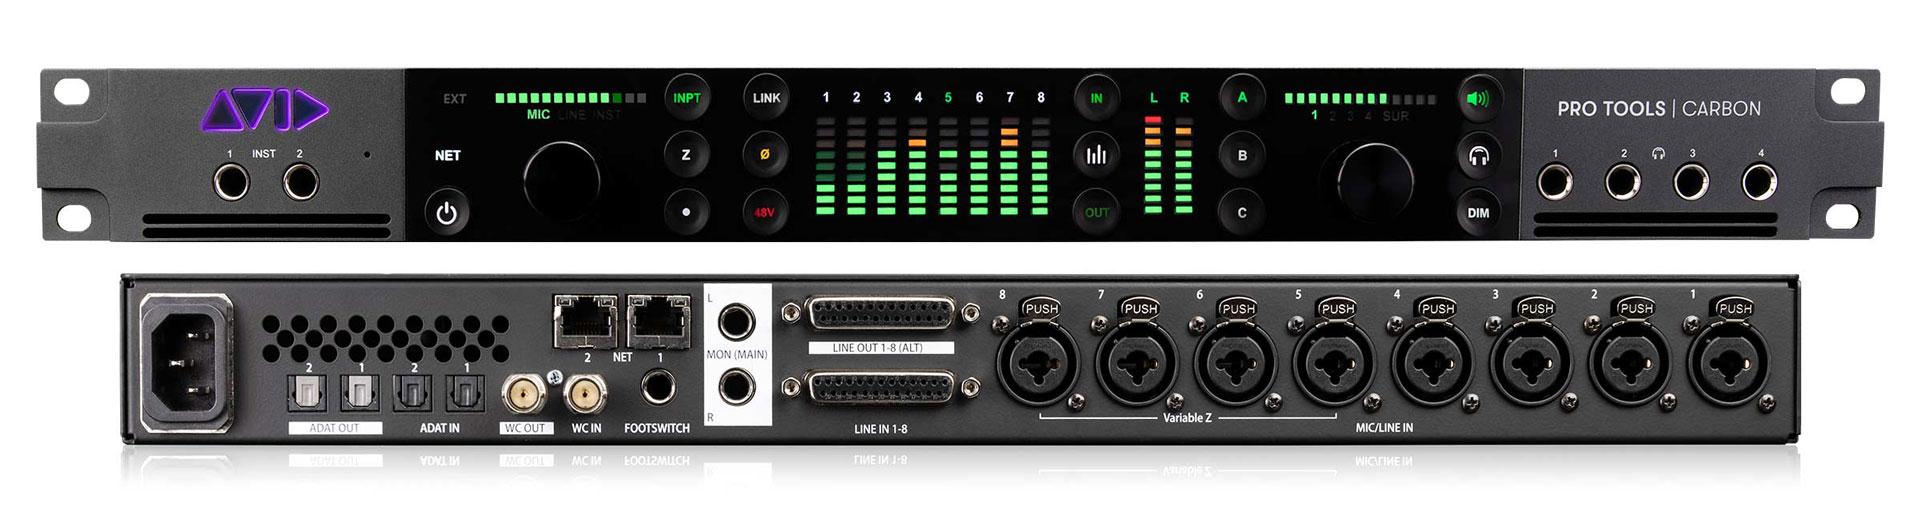 Avid Pro Tools Carbon audio interface